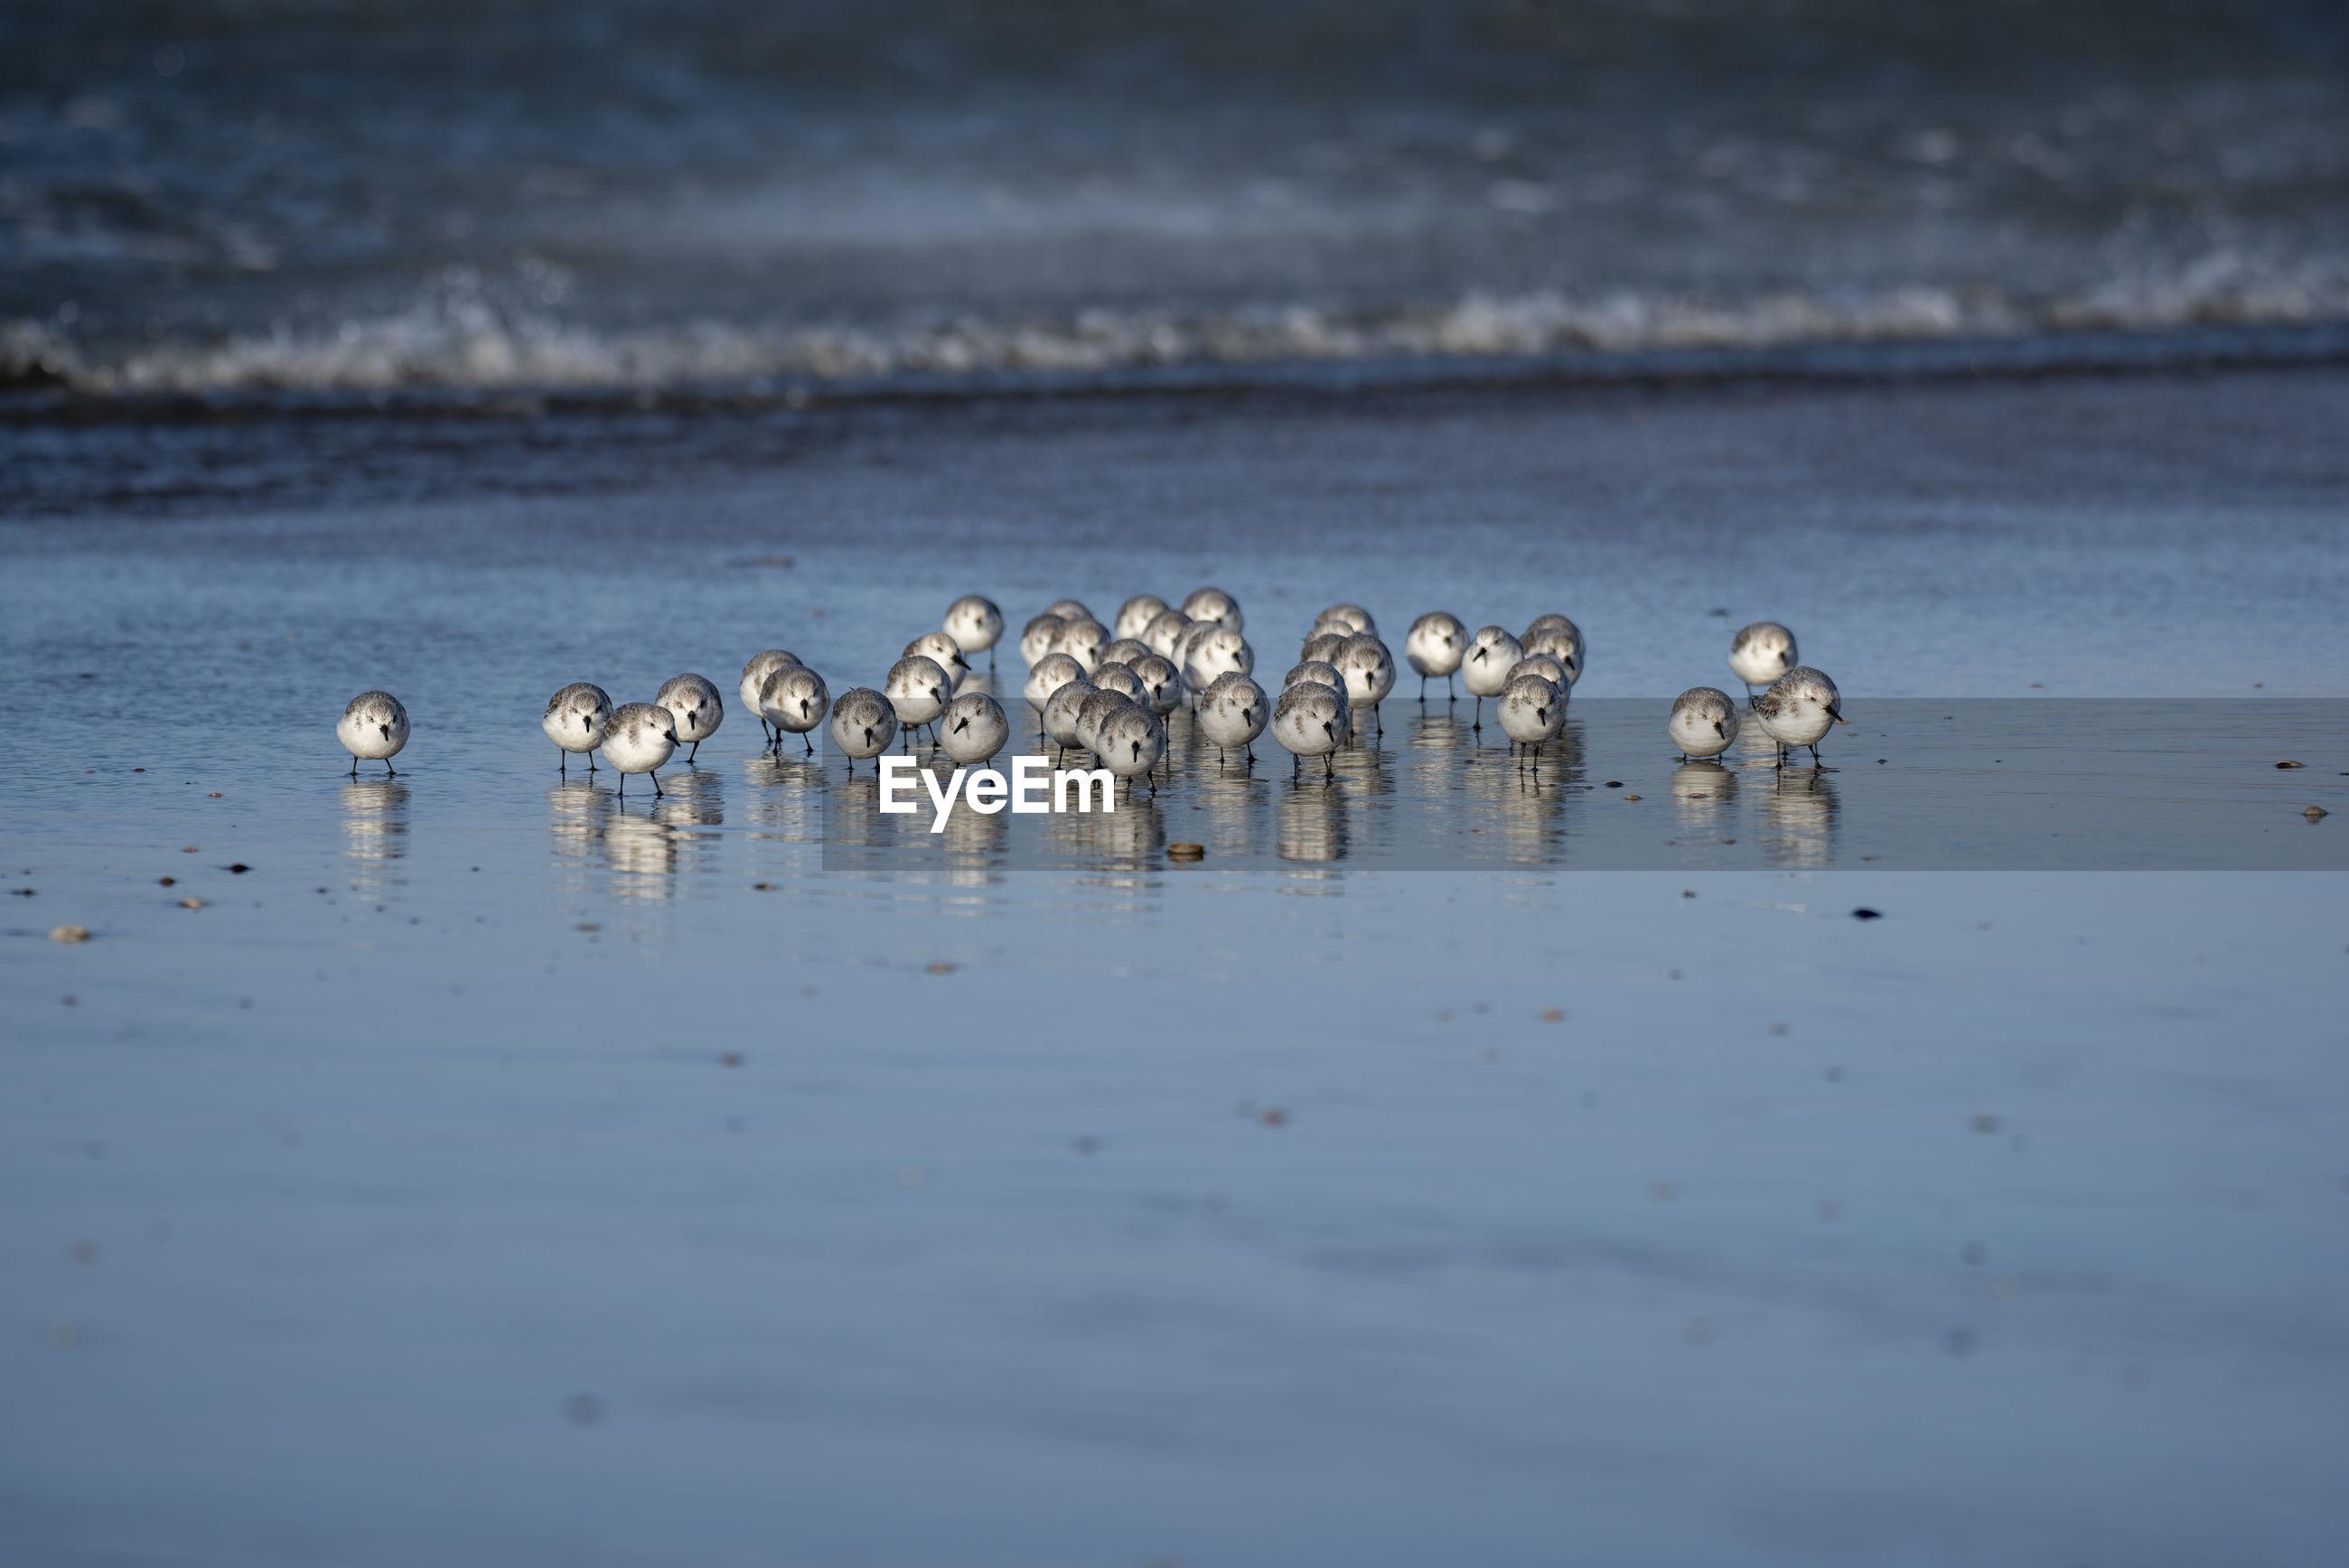 Flock of birds perching on shore at beach